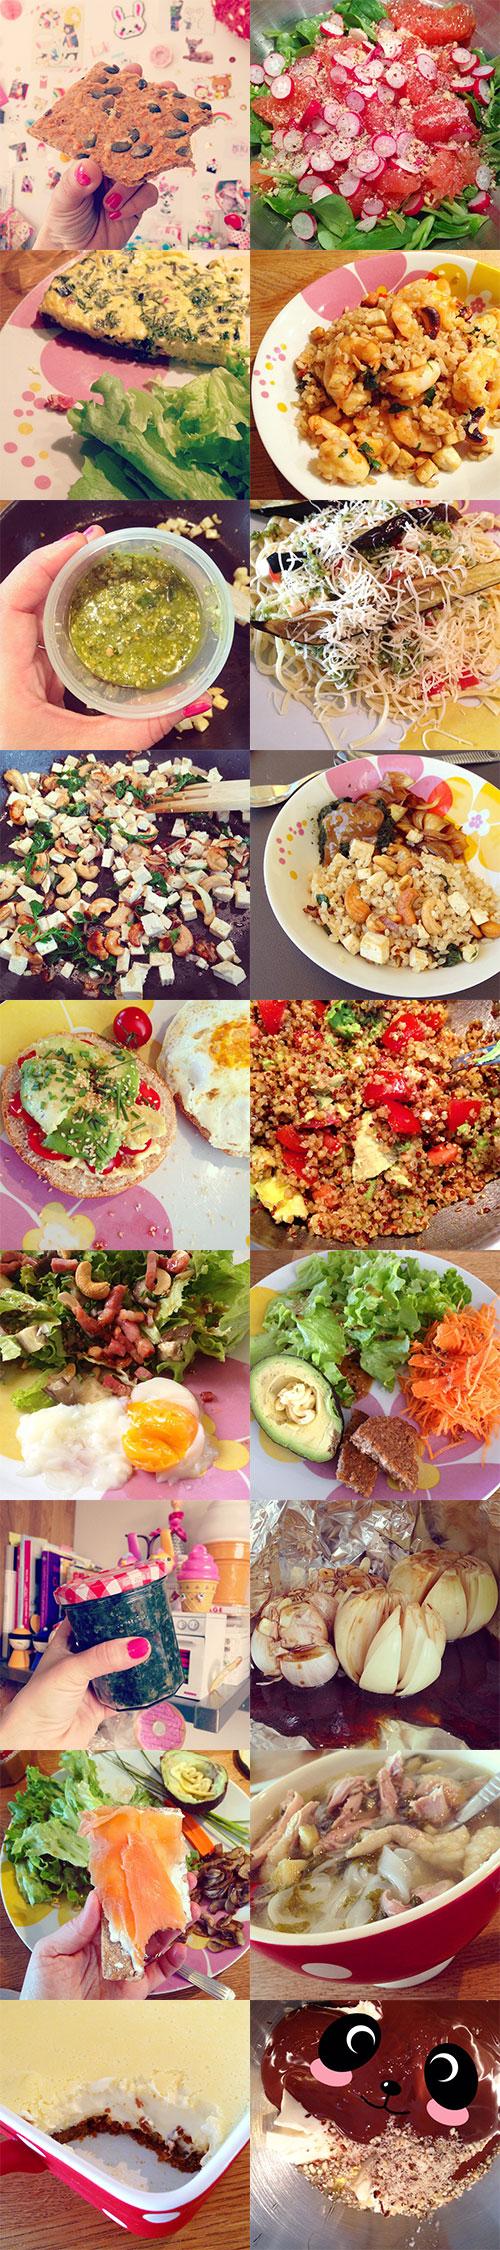 Mieux-Manger-Cuisine-Vegetarienne